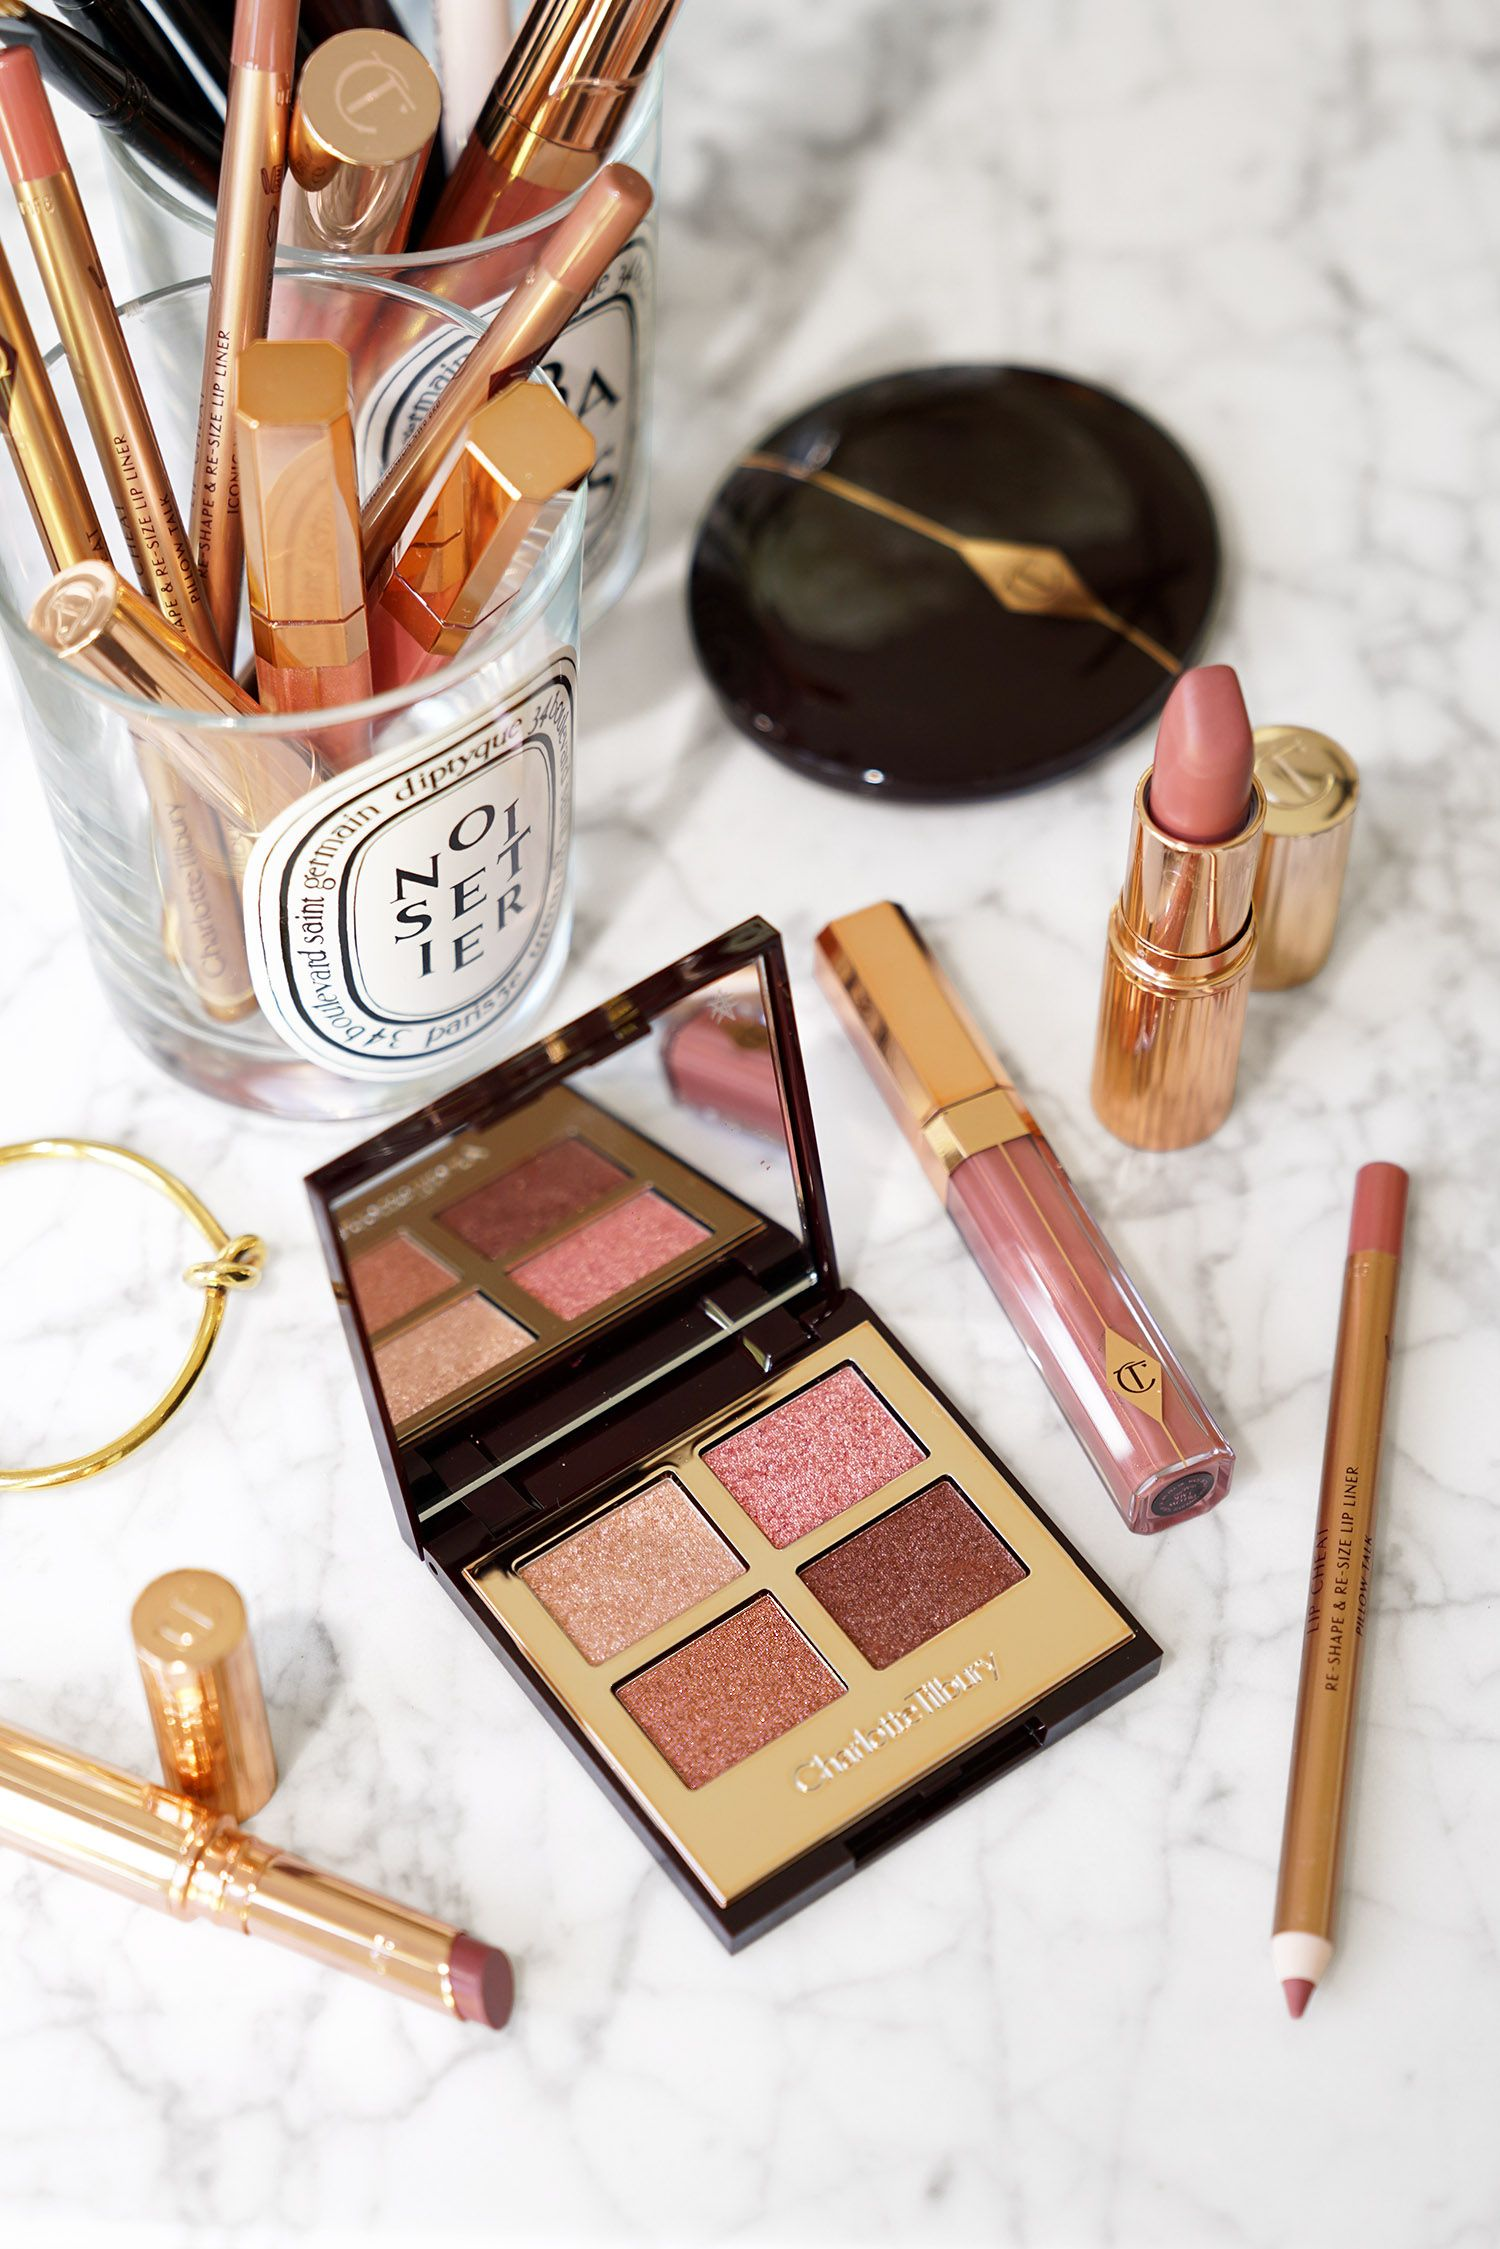 Pin by Maggie Zabi on parfume in 2020 Lush lipstick